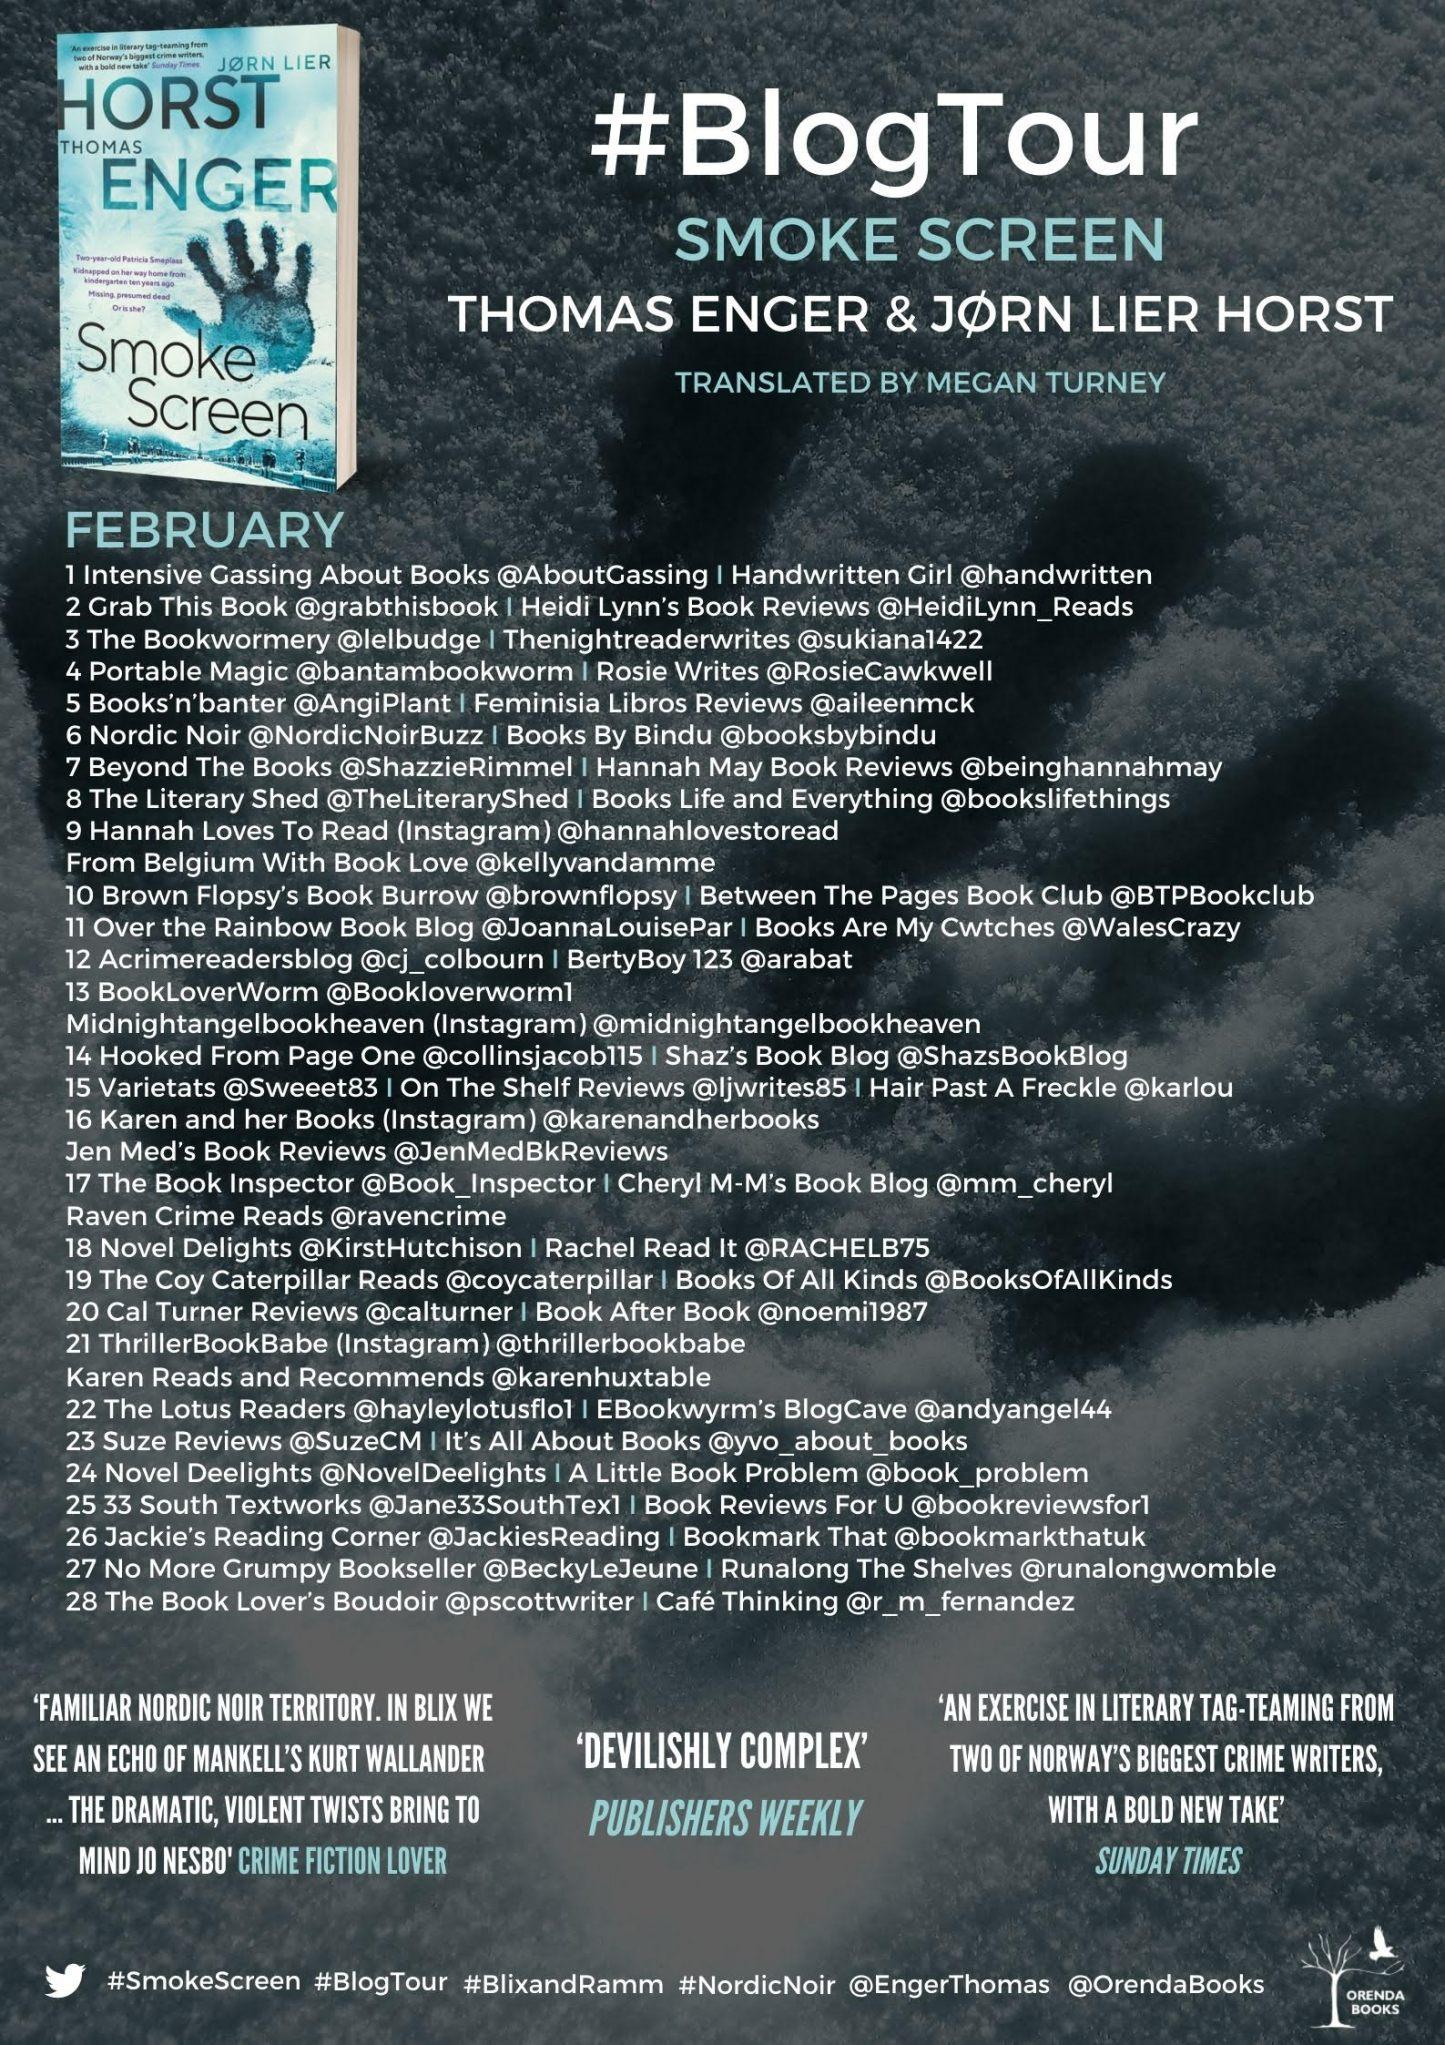 #BlogTour- Thomas Enger/ Jørn Lier Horst- Smoke Screen (tr. Megan Turney)